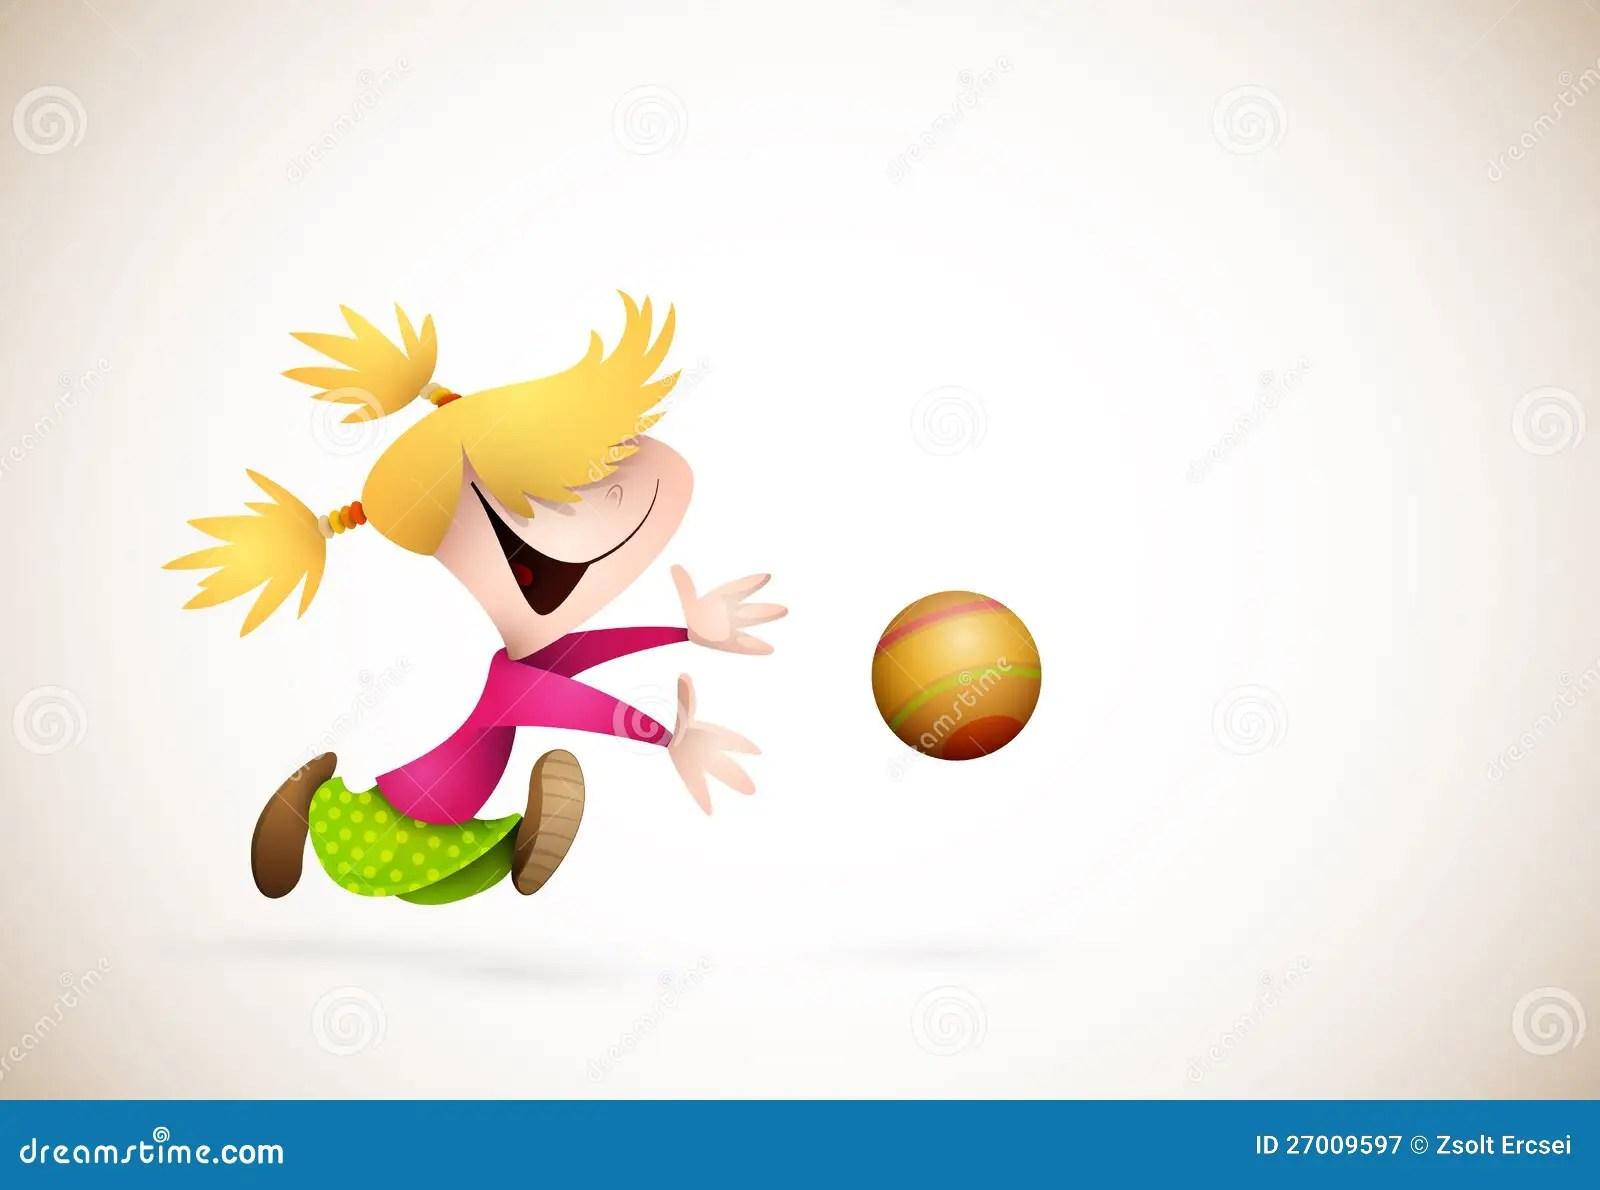 Lovely Wallpaper Girl And Boy Little Girl Playing Handball Stock Vector Image 27009597